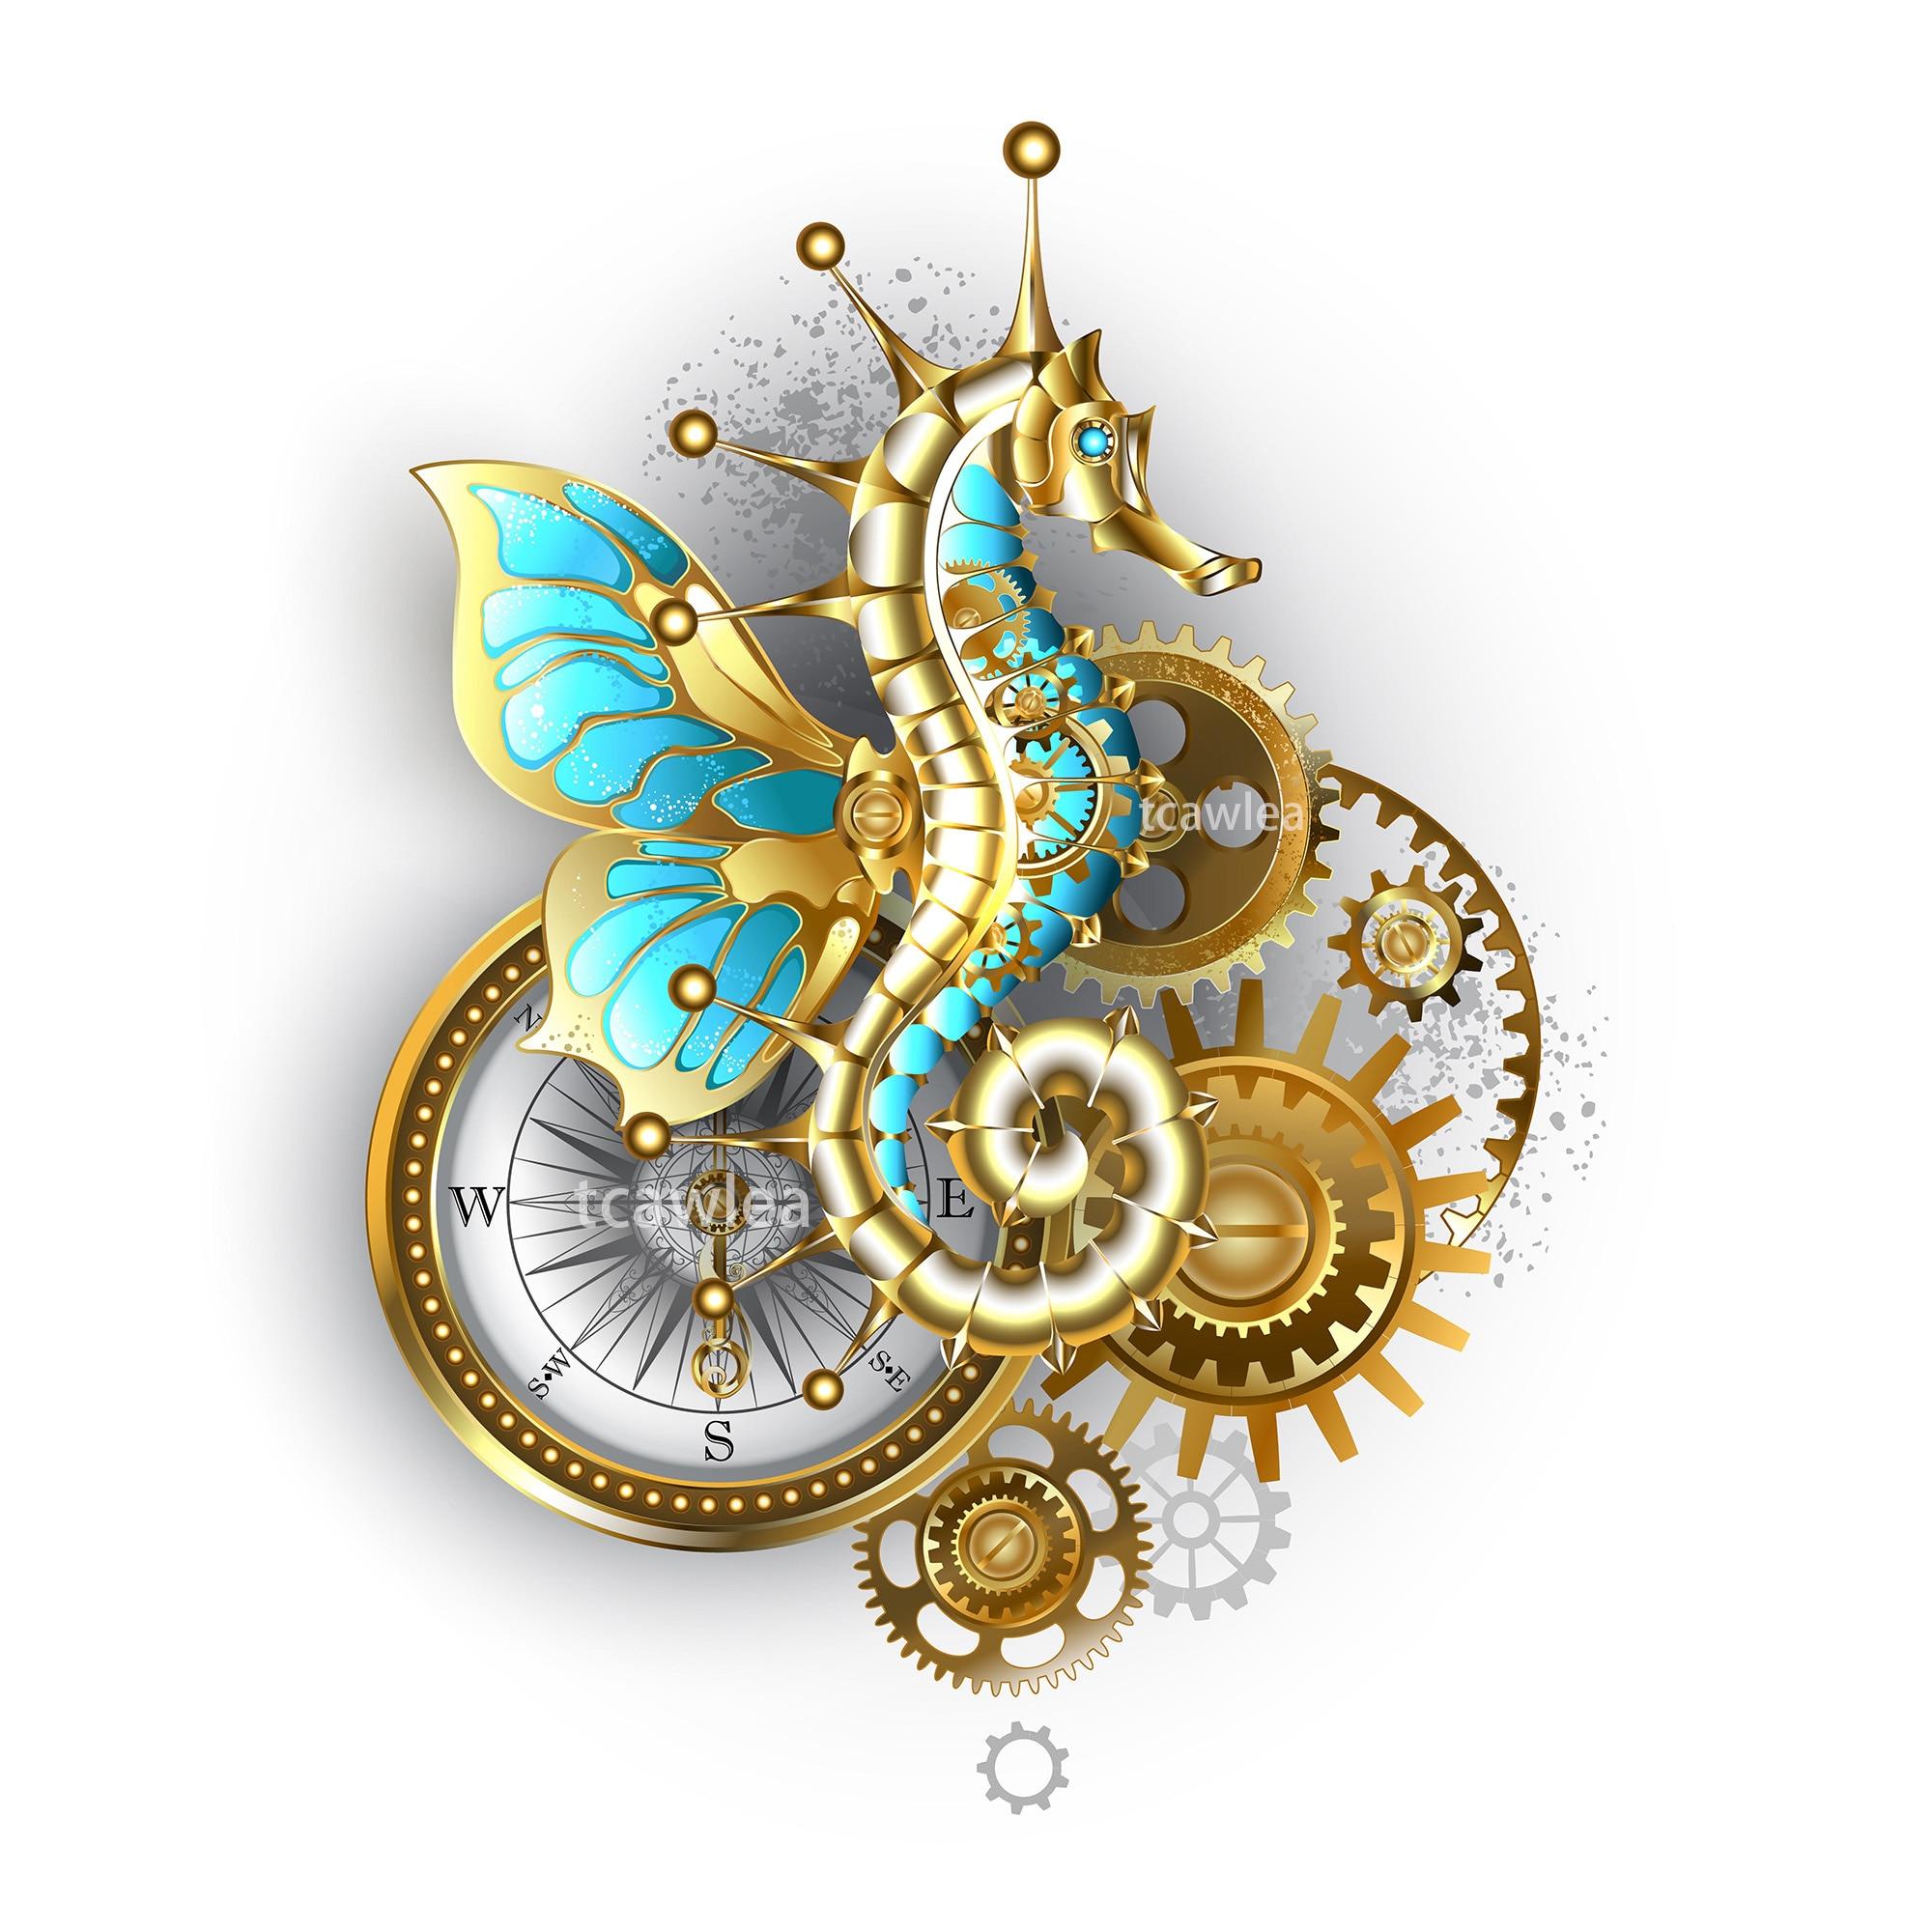 Steampunk Flying Hippocampus Metal Cutting Dies Ocean Gear Animal Stencil For DIY Scrapbooking Card